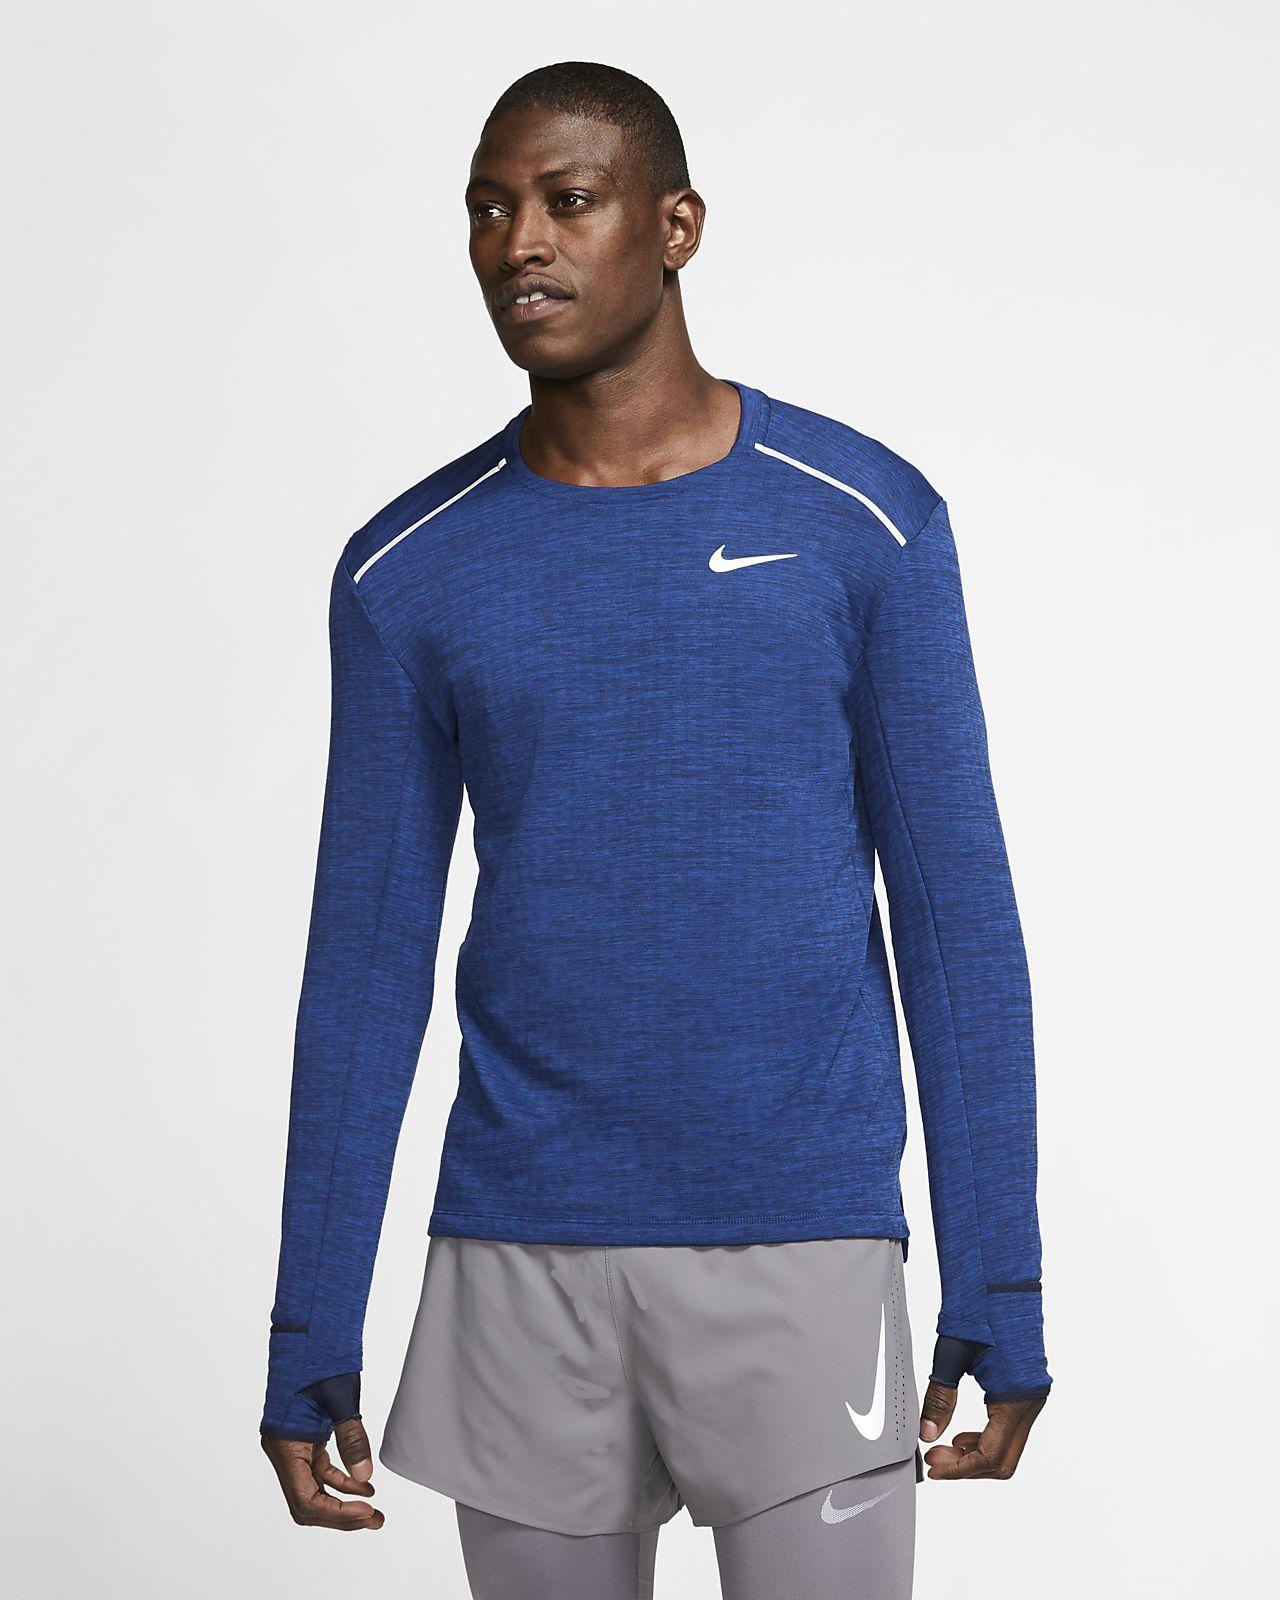 Nike Therma Sphere Element 3.0 Men's Long-Sleeved Running Top